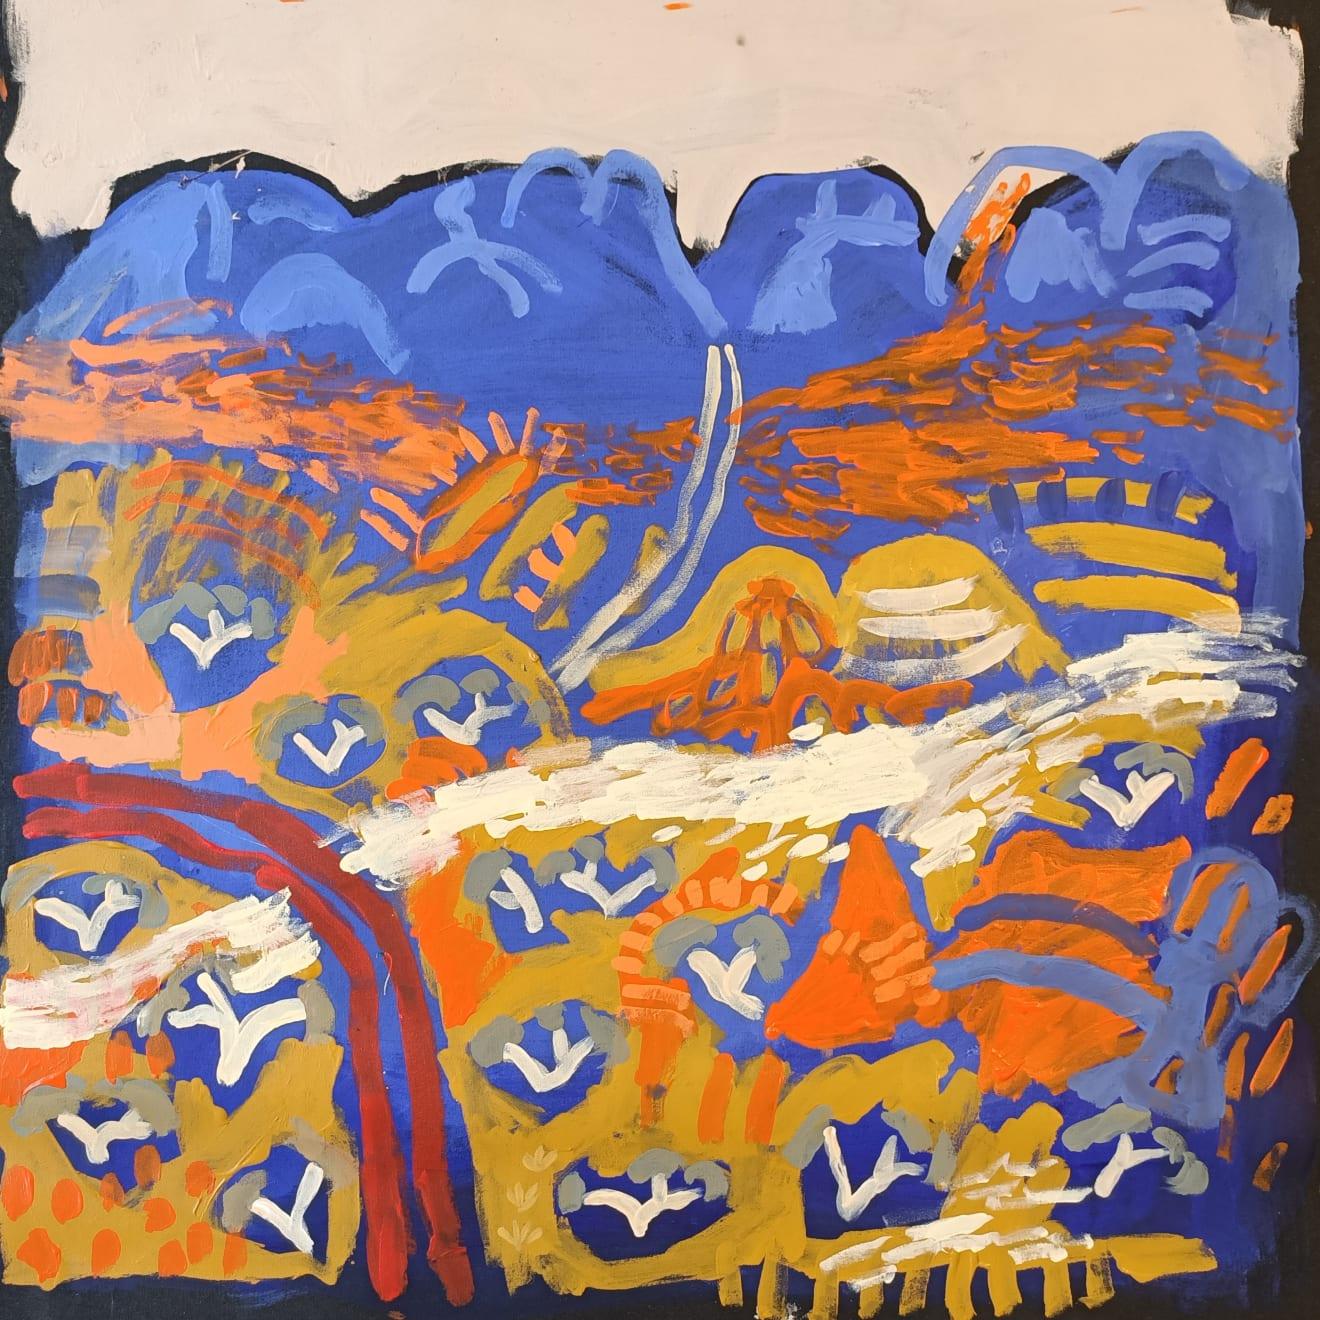 Zak Tilley Rare Rain in Papunya Acrylic on Canvas Original 60 x 60 cm $800 £400 SOLD